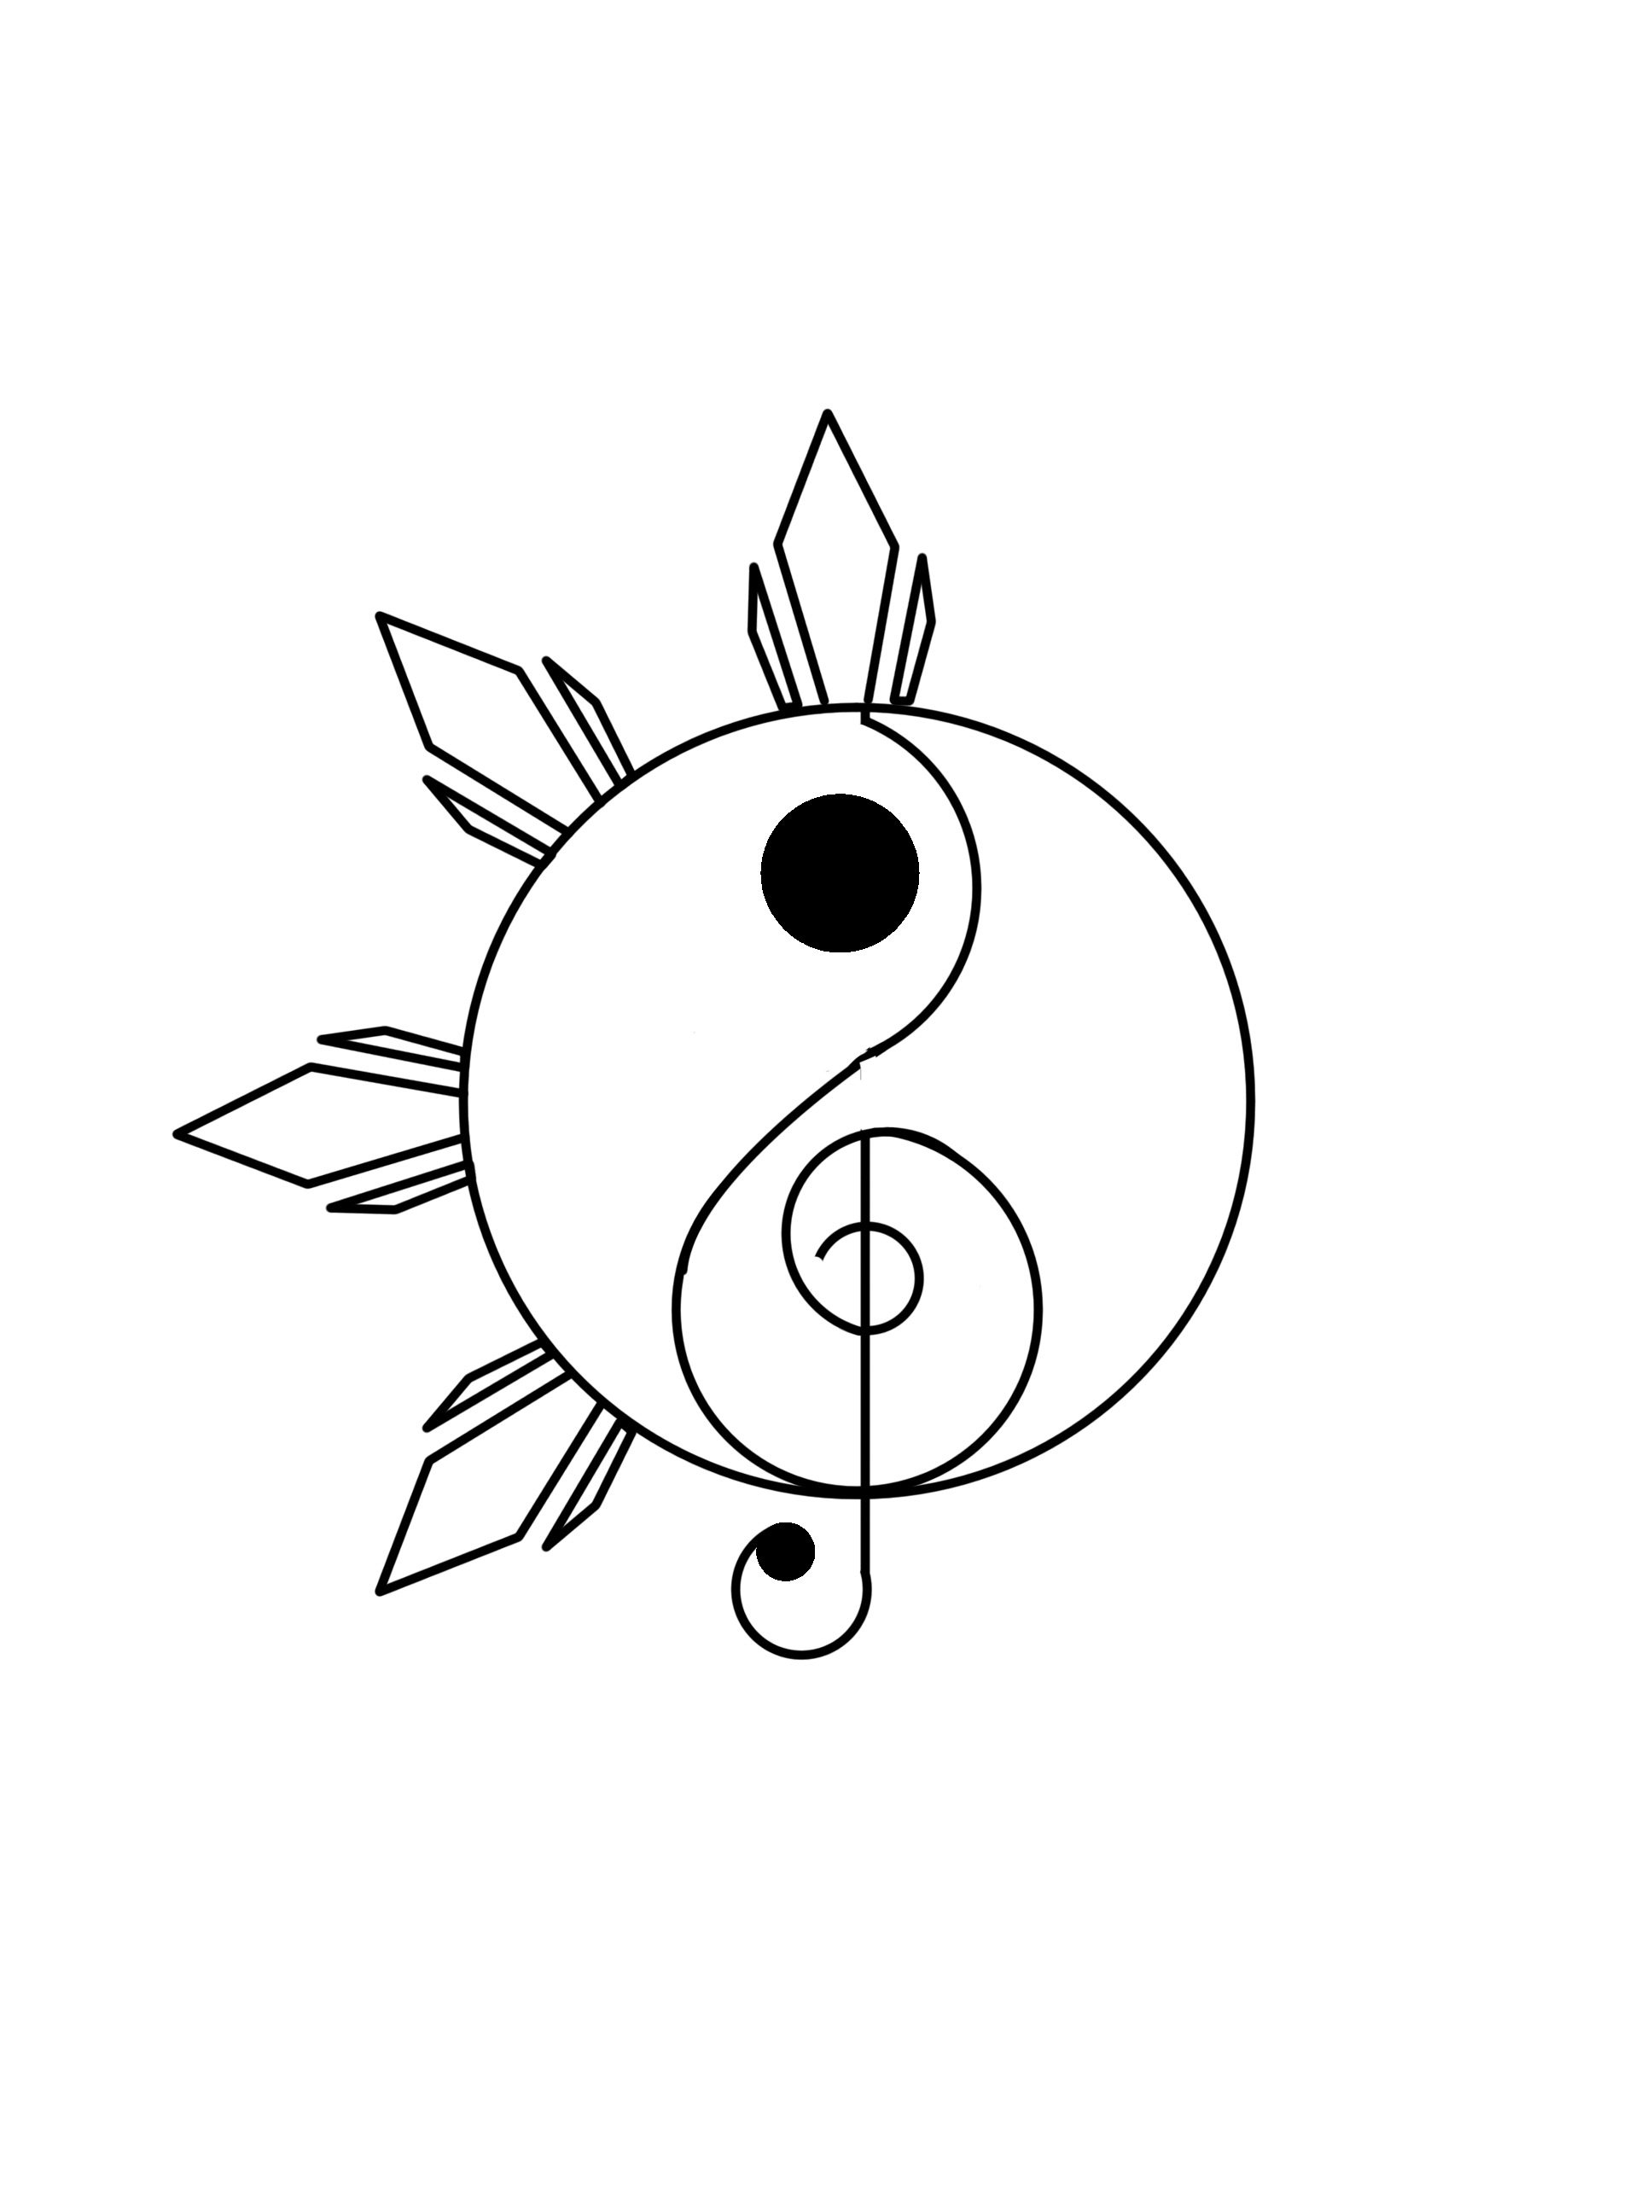 Yin Yang Drawing Designs